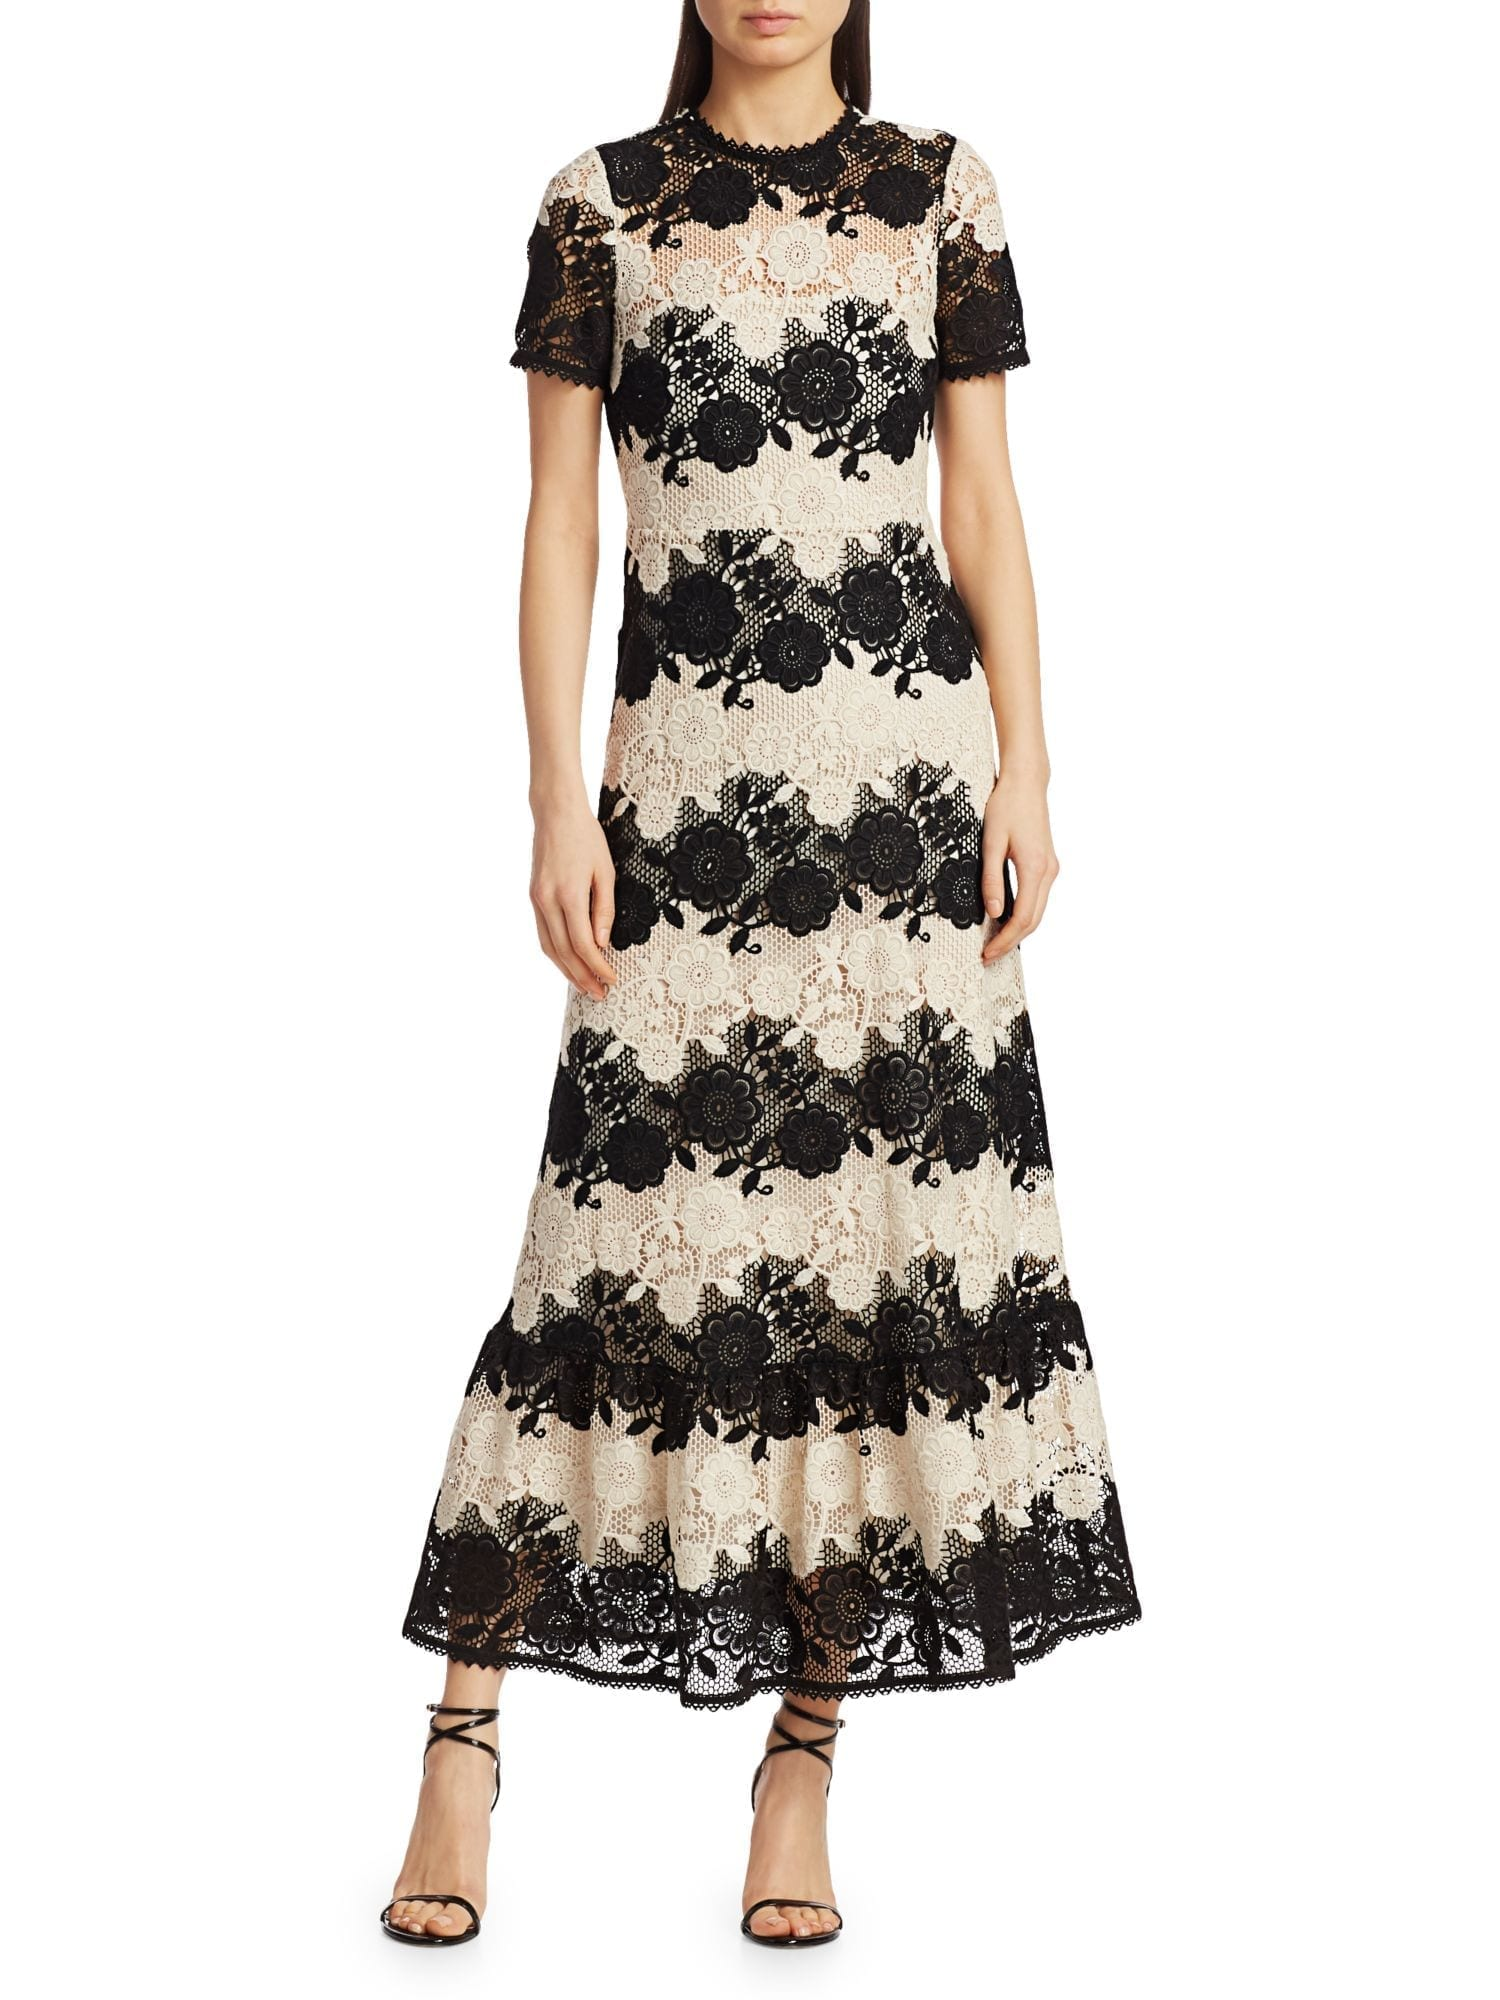 REDVALENTINO Lace A-Line Dress